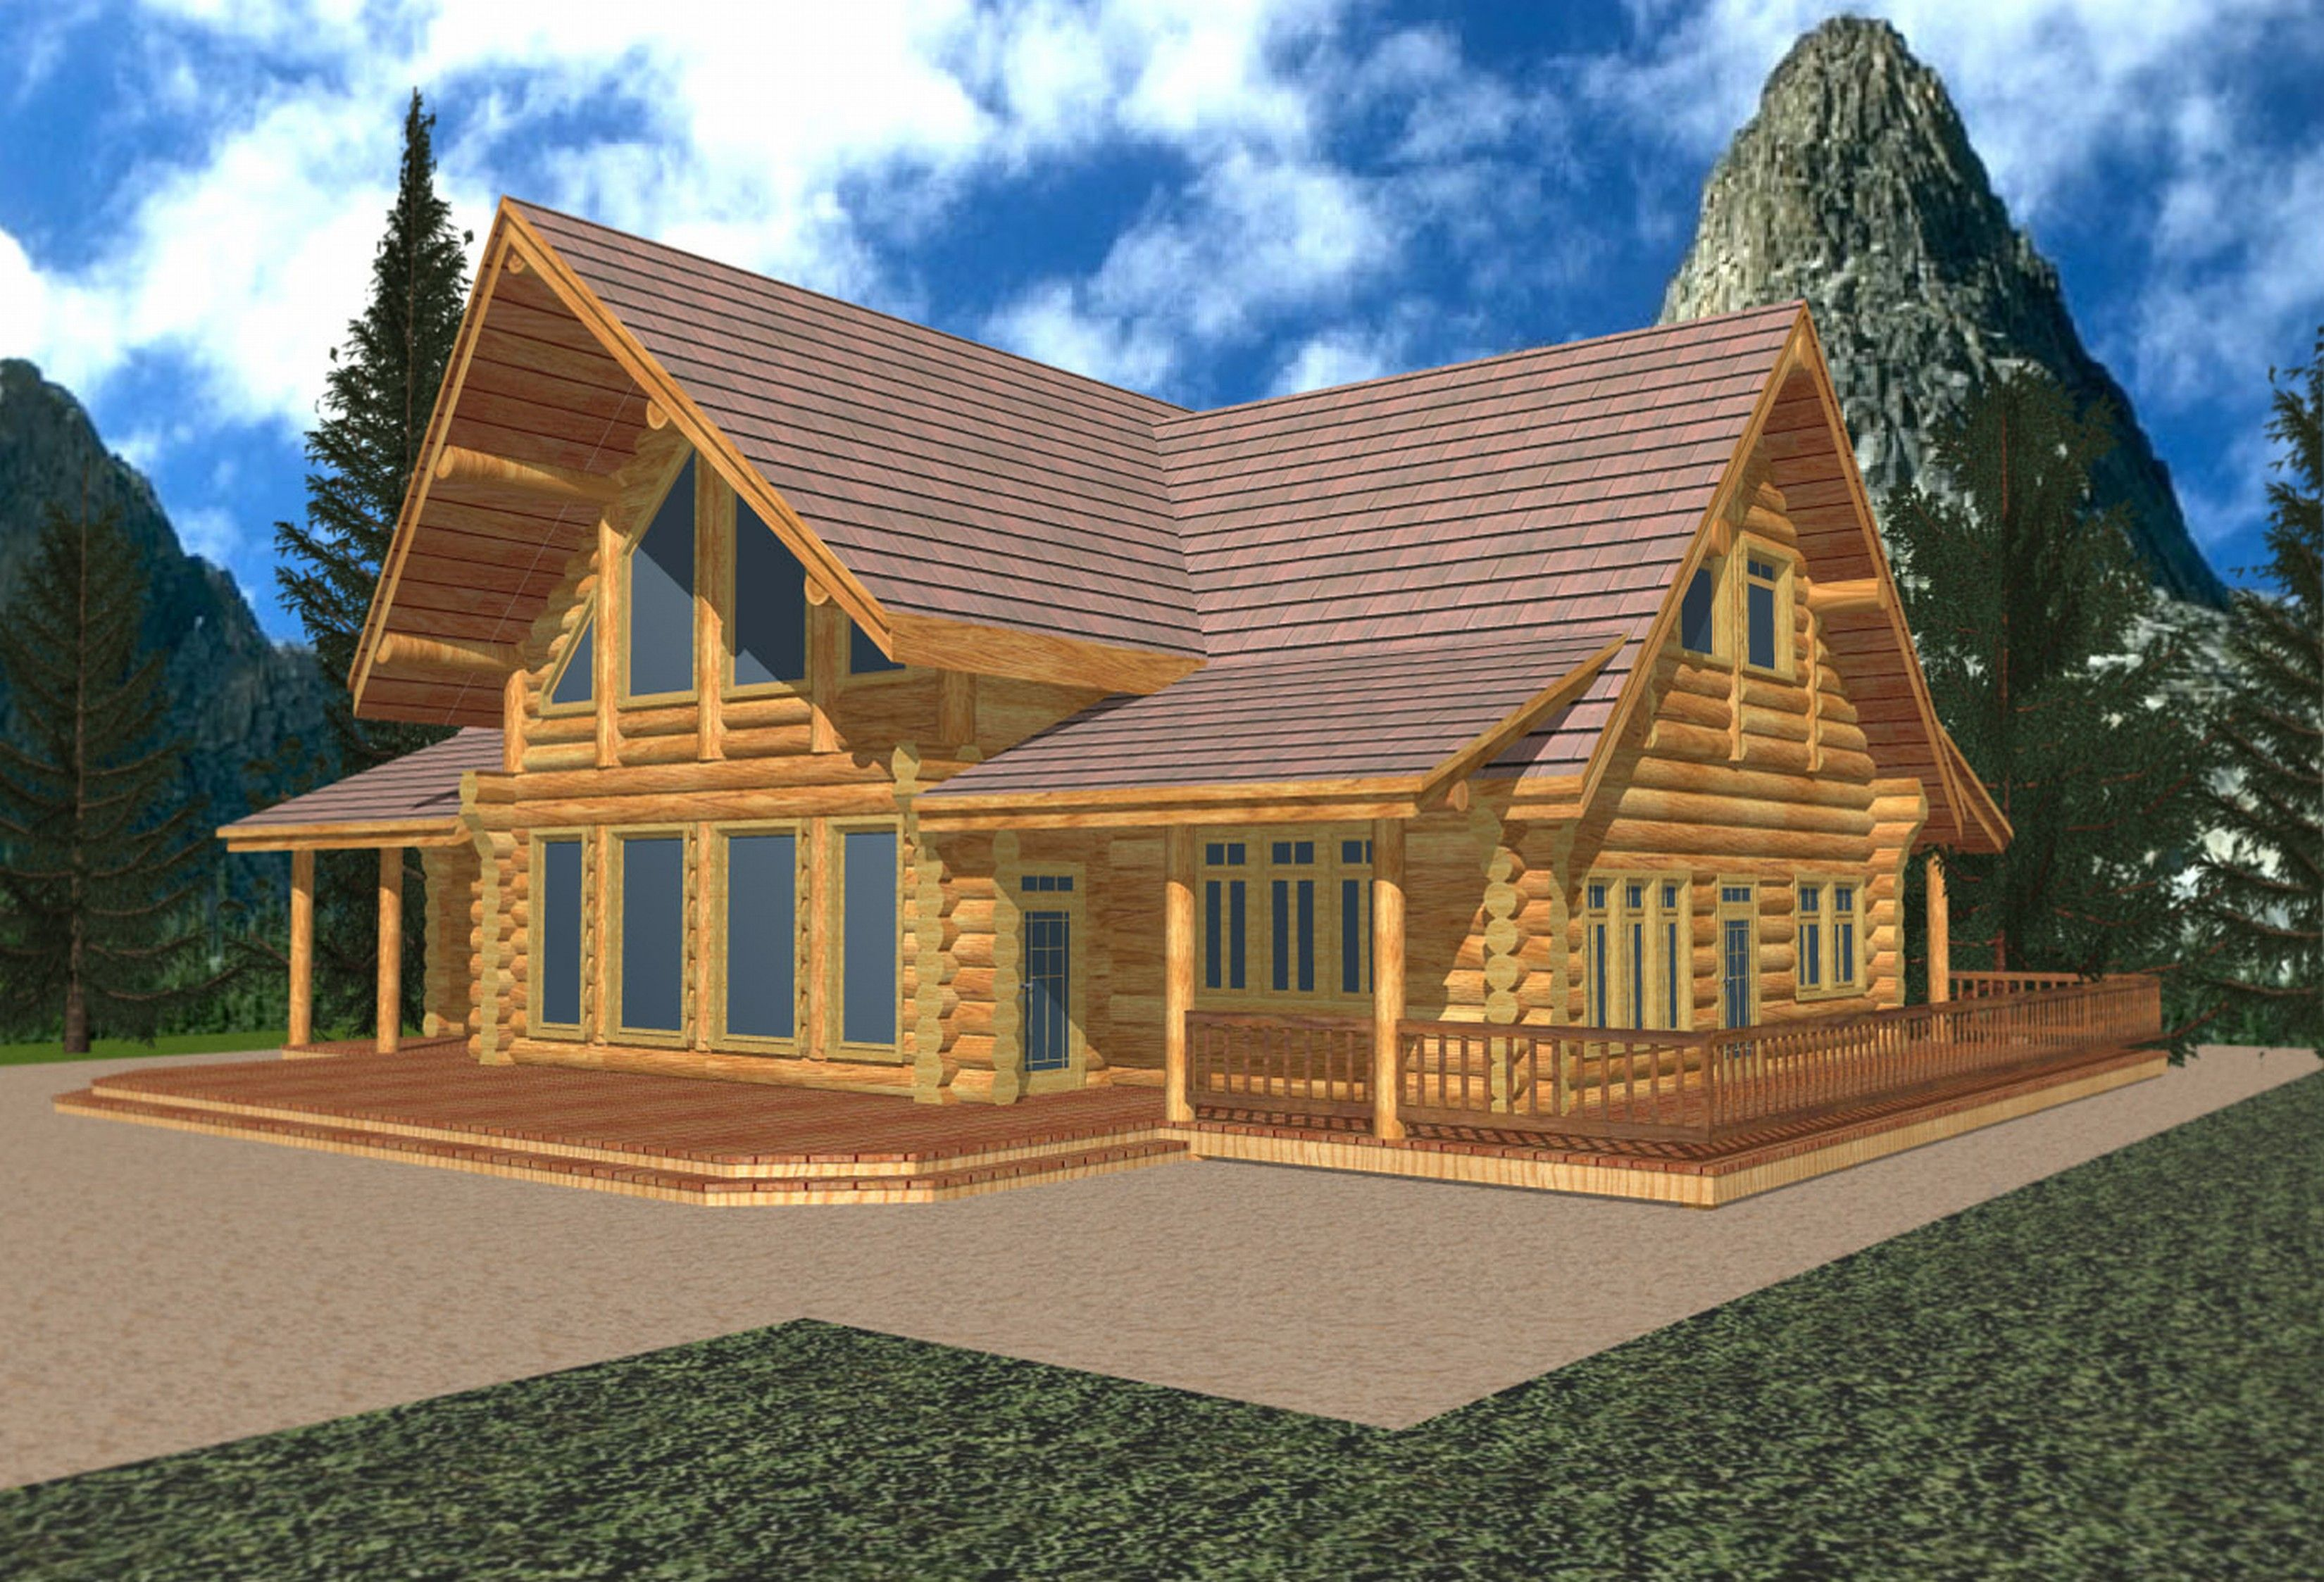 Mountain Homes Single Story 2680 Sq Ft Classic Whistler Log Design Coast Mountain Log Homes Log Cabin House Plans Log Home Plans Cabin House Plans